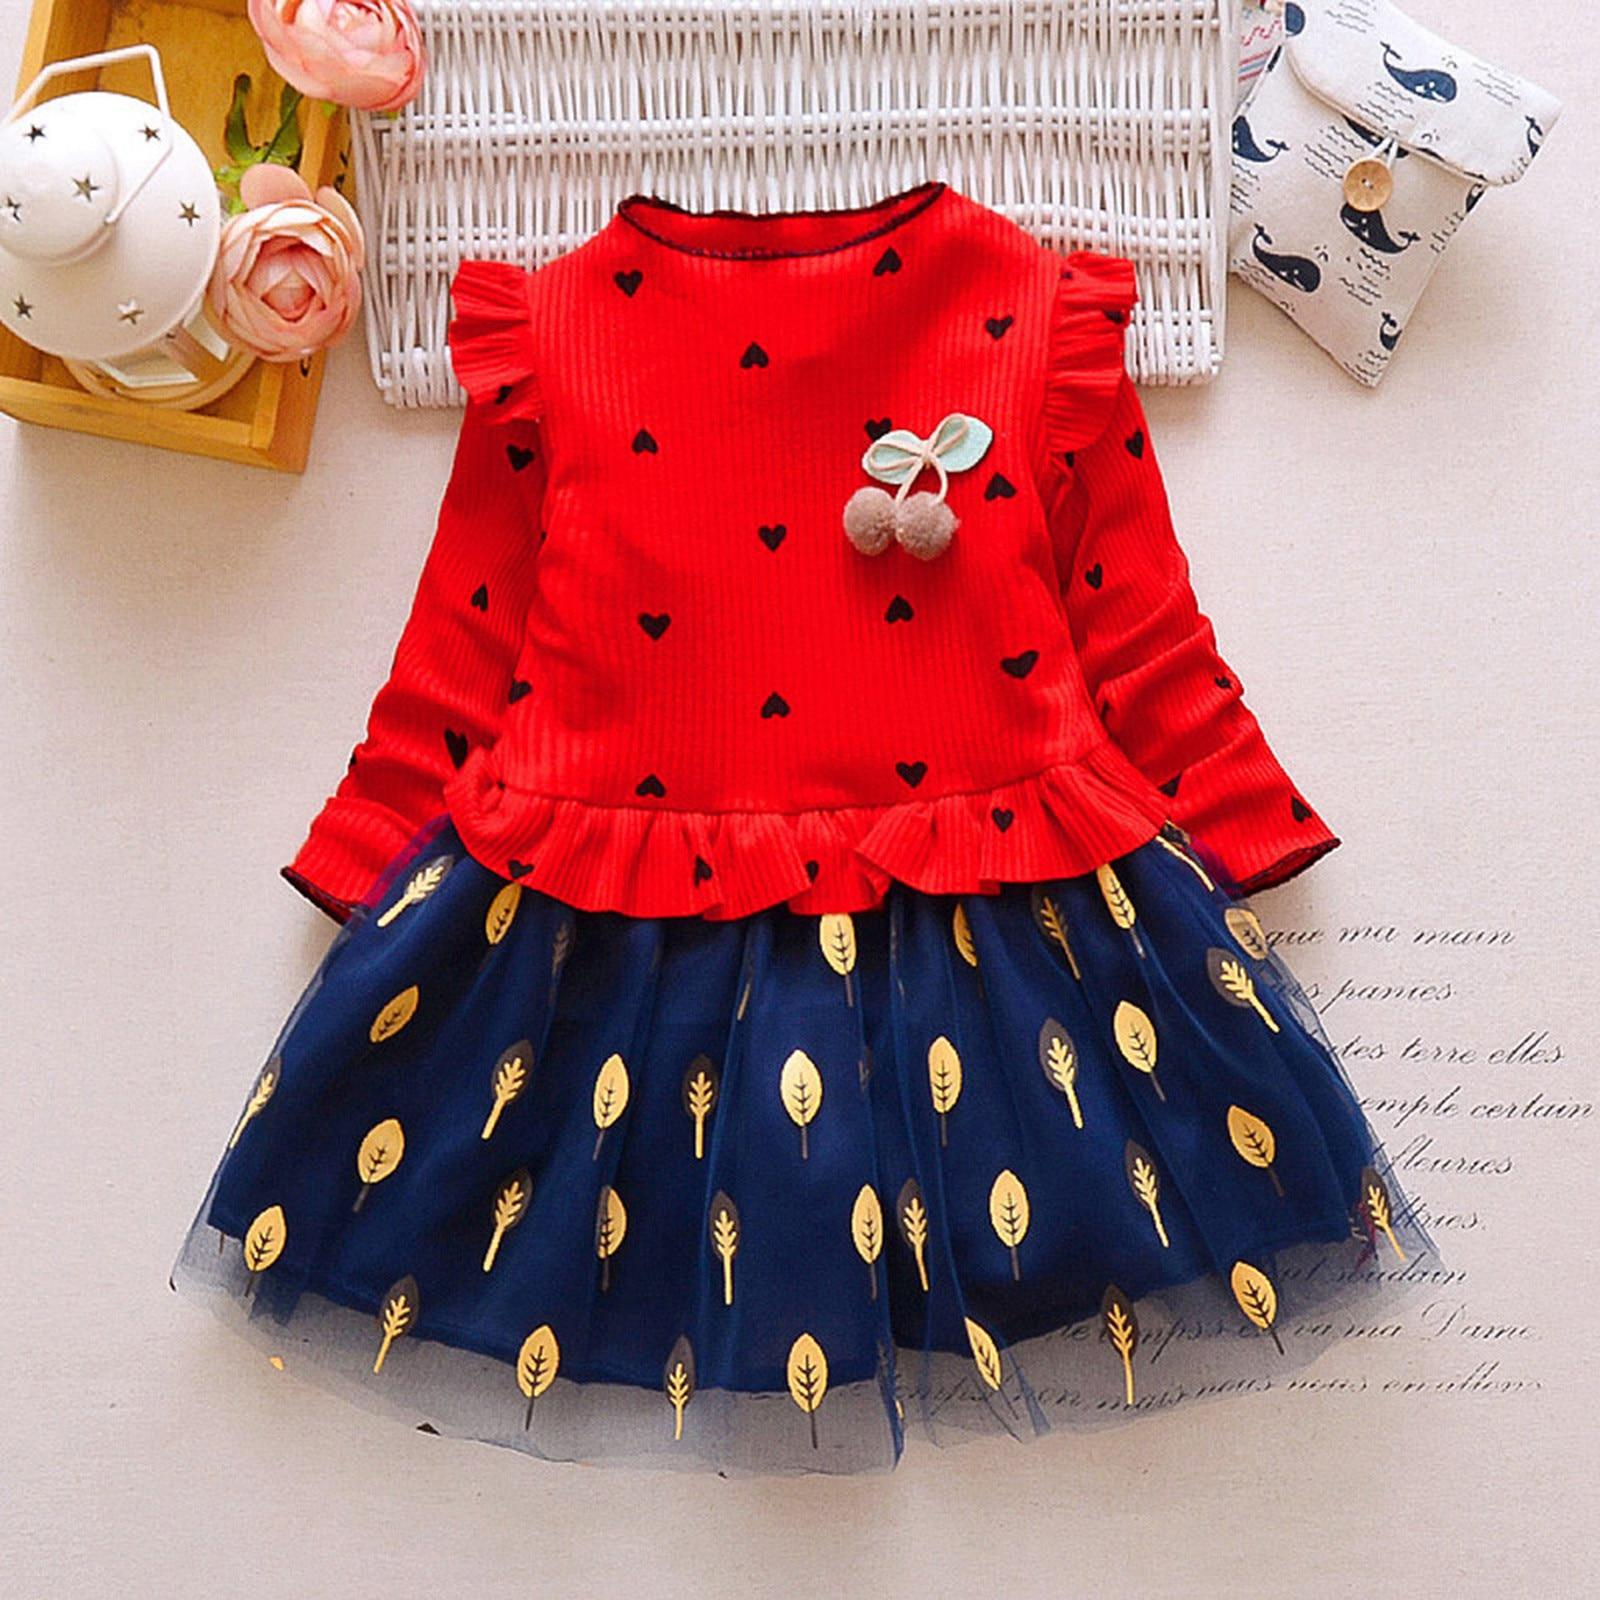 40# Toddler Kids Dresses Baby Girls' Long-sleeved Leaf Net Yarn Stitching Dress Love Dress Kids Clothes Girls תחפושות לתינוקות 1